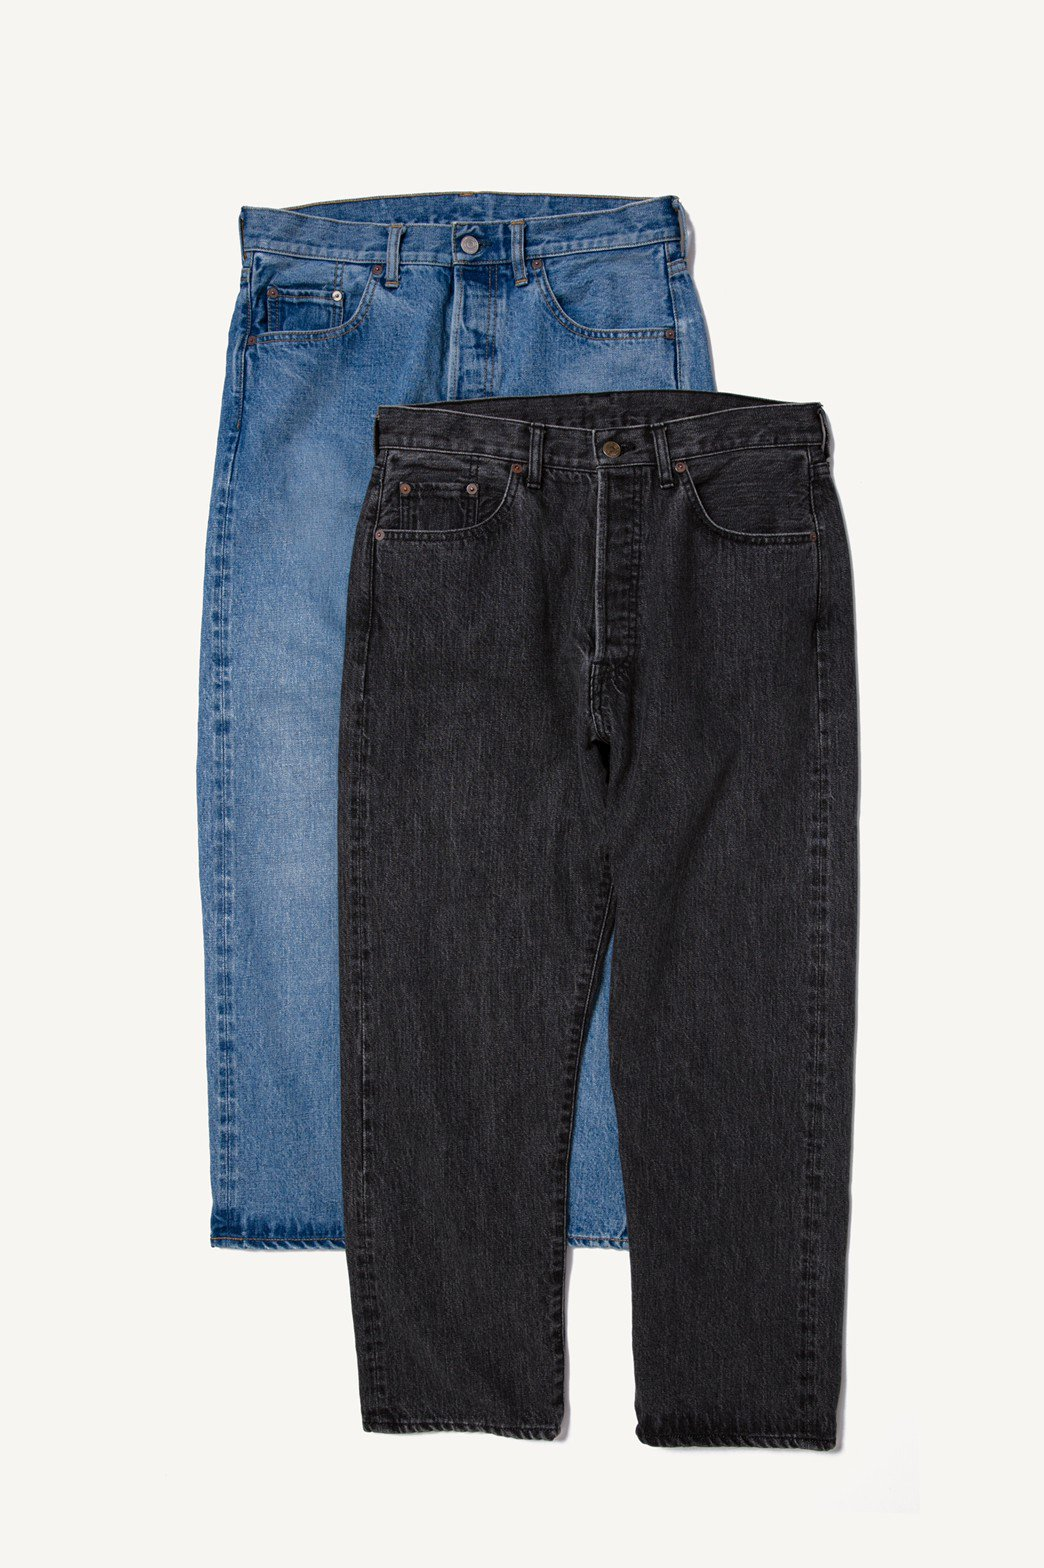 A.PRESSE / Washed Denim Pants